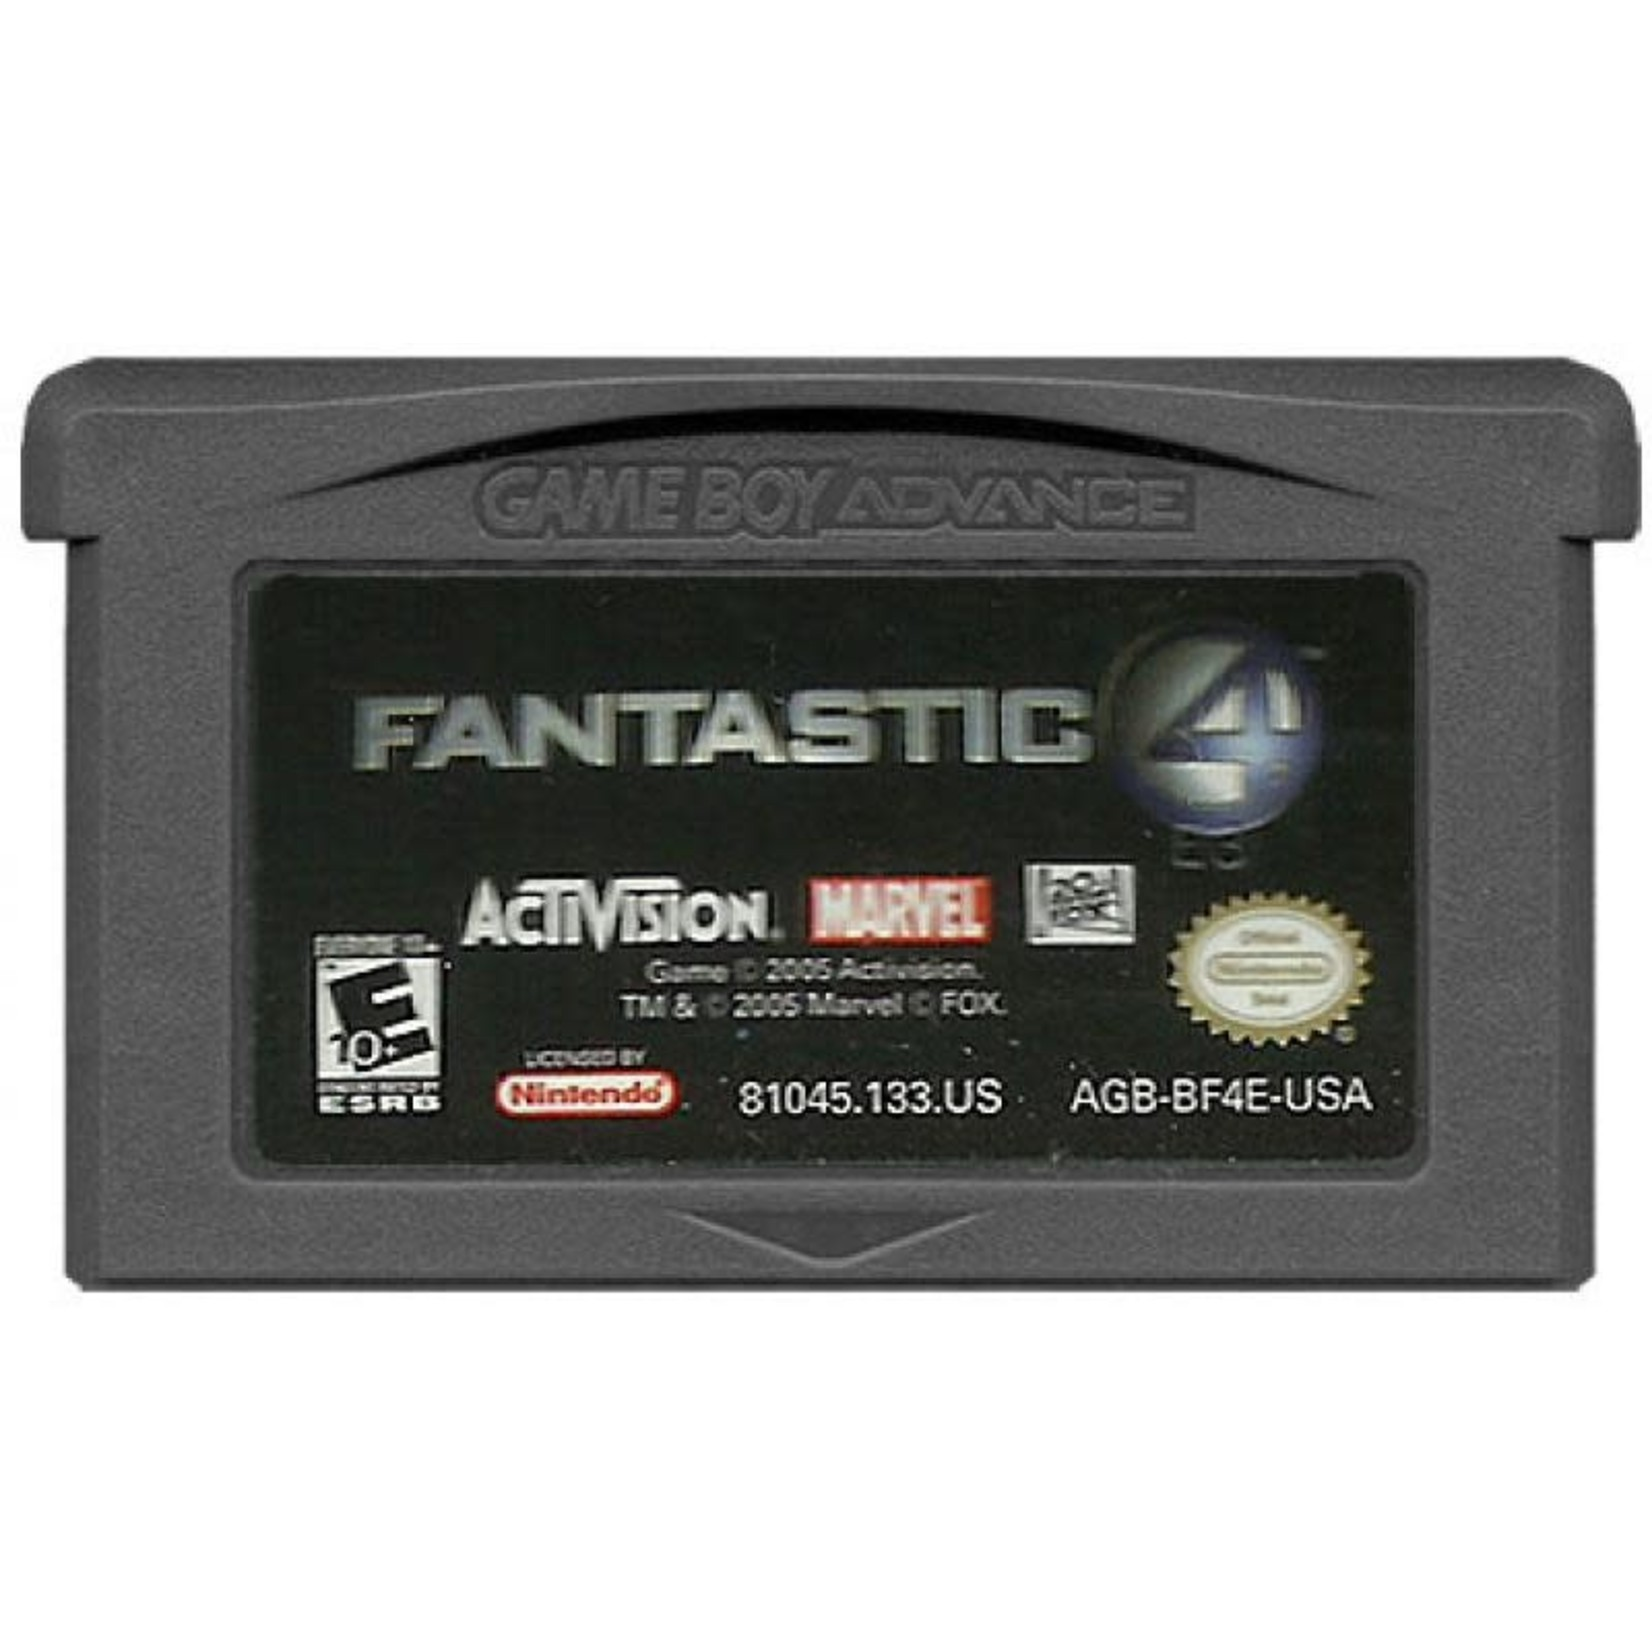 GBAU-Fantastic Four(Cartridge)